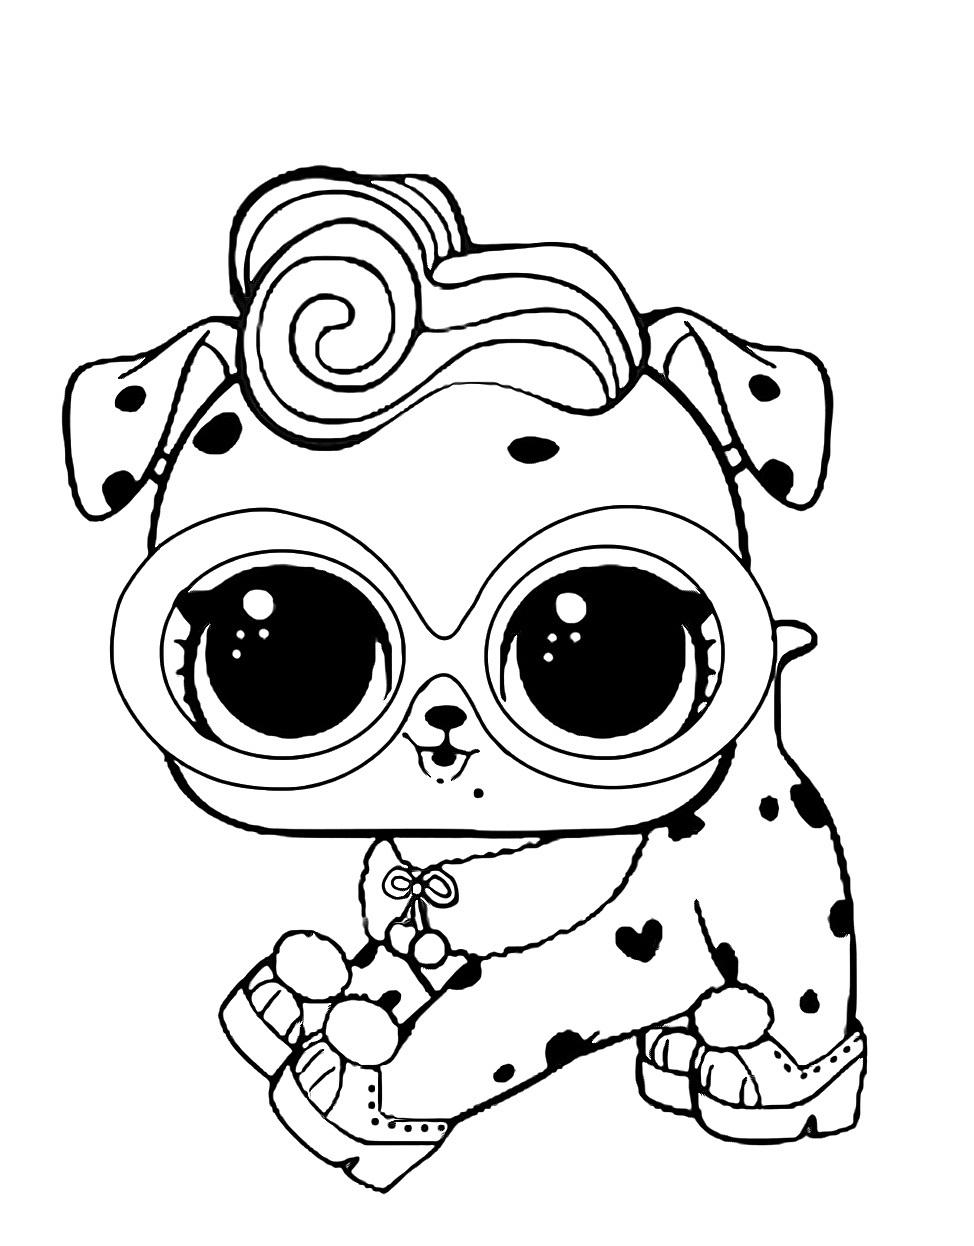 Кукла ЛОЛ долматинец - Куклы LOL - Раскраски антистресс